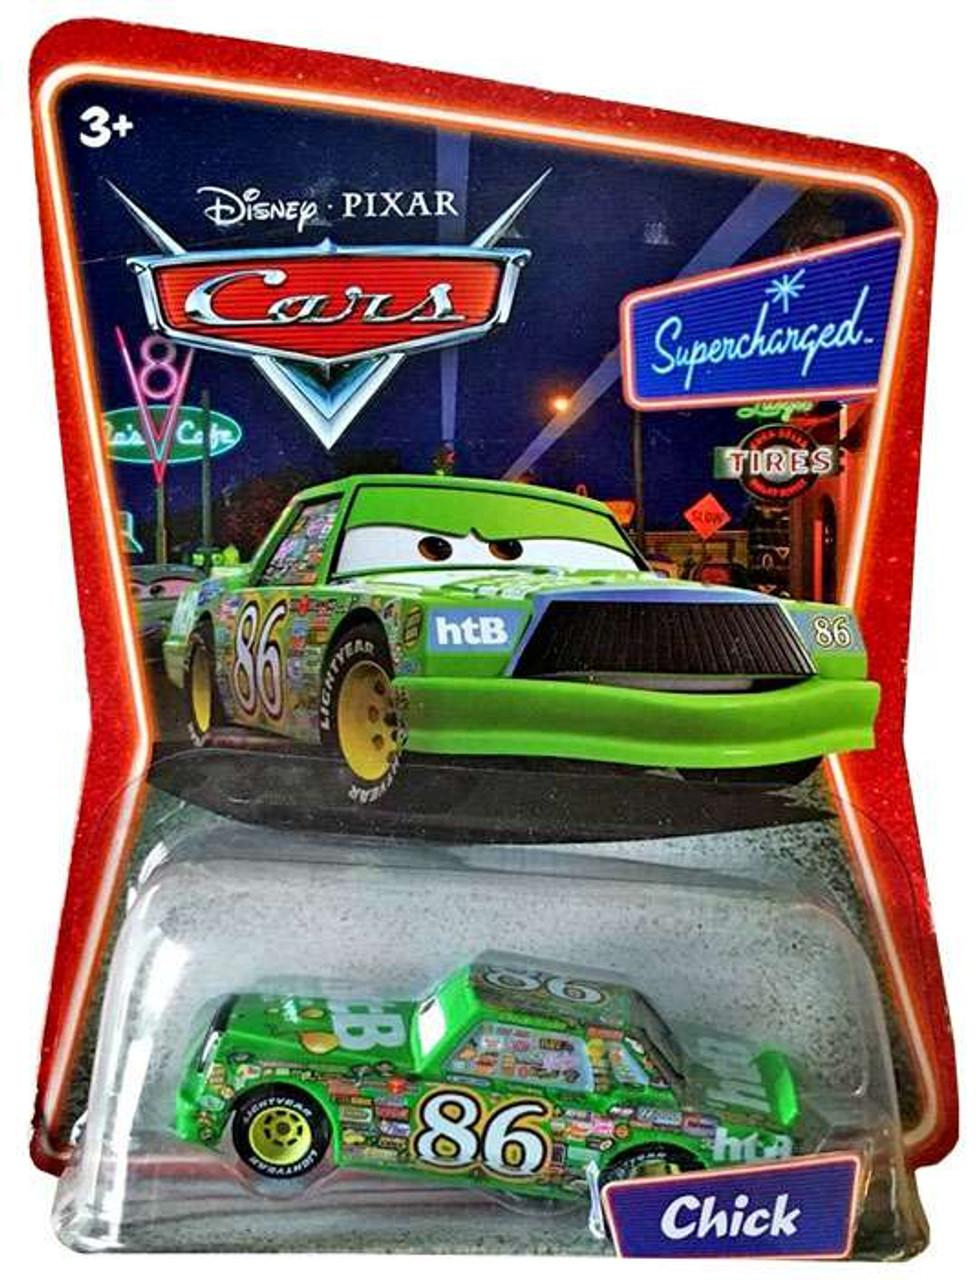 Disney Pixar Cars Supercharged Chick Hicks 155 Diecast Car Mattel